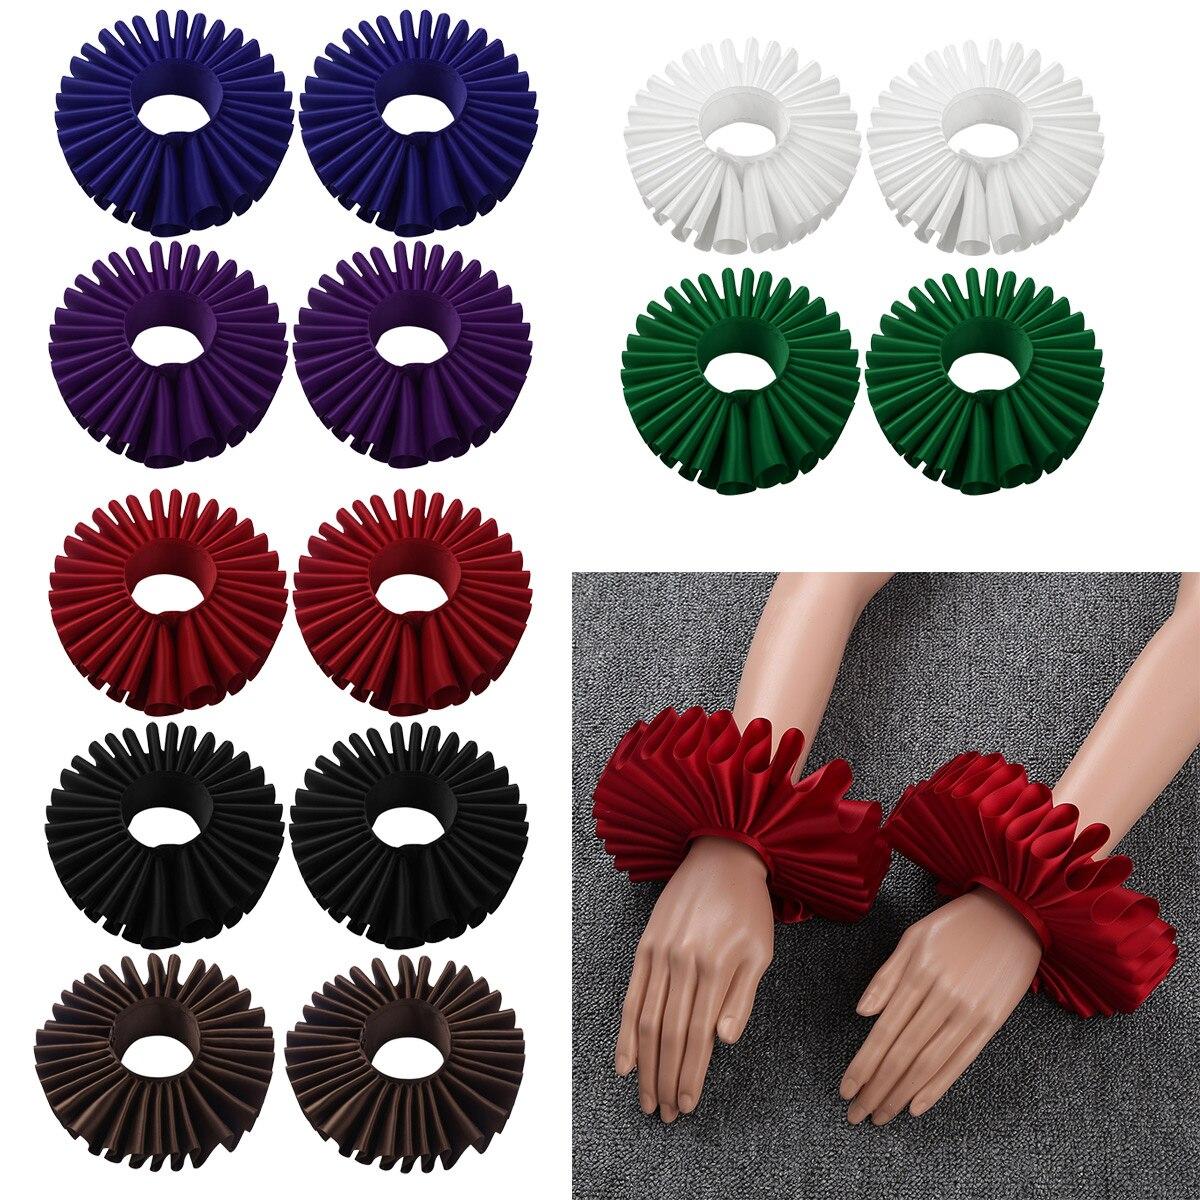 1 Pair Renaissance Elizabethan Ruffled Wrist Sleeves Cuffs Bracelet Victorian Costume Halloween Cosplay Accessories